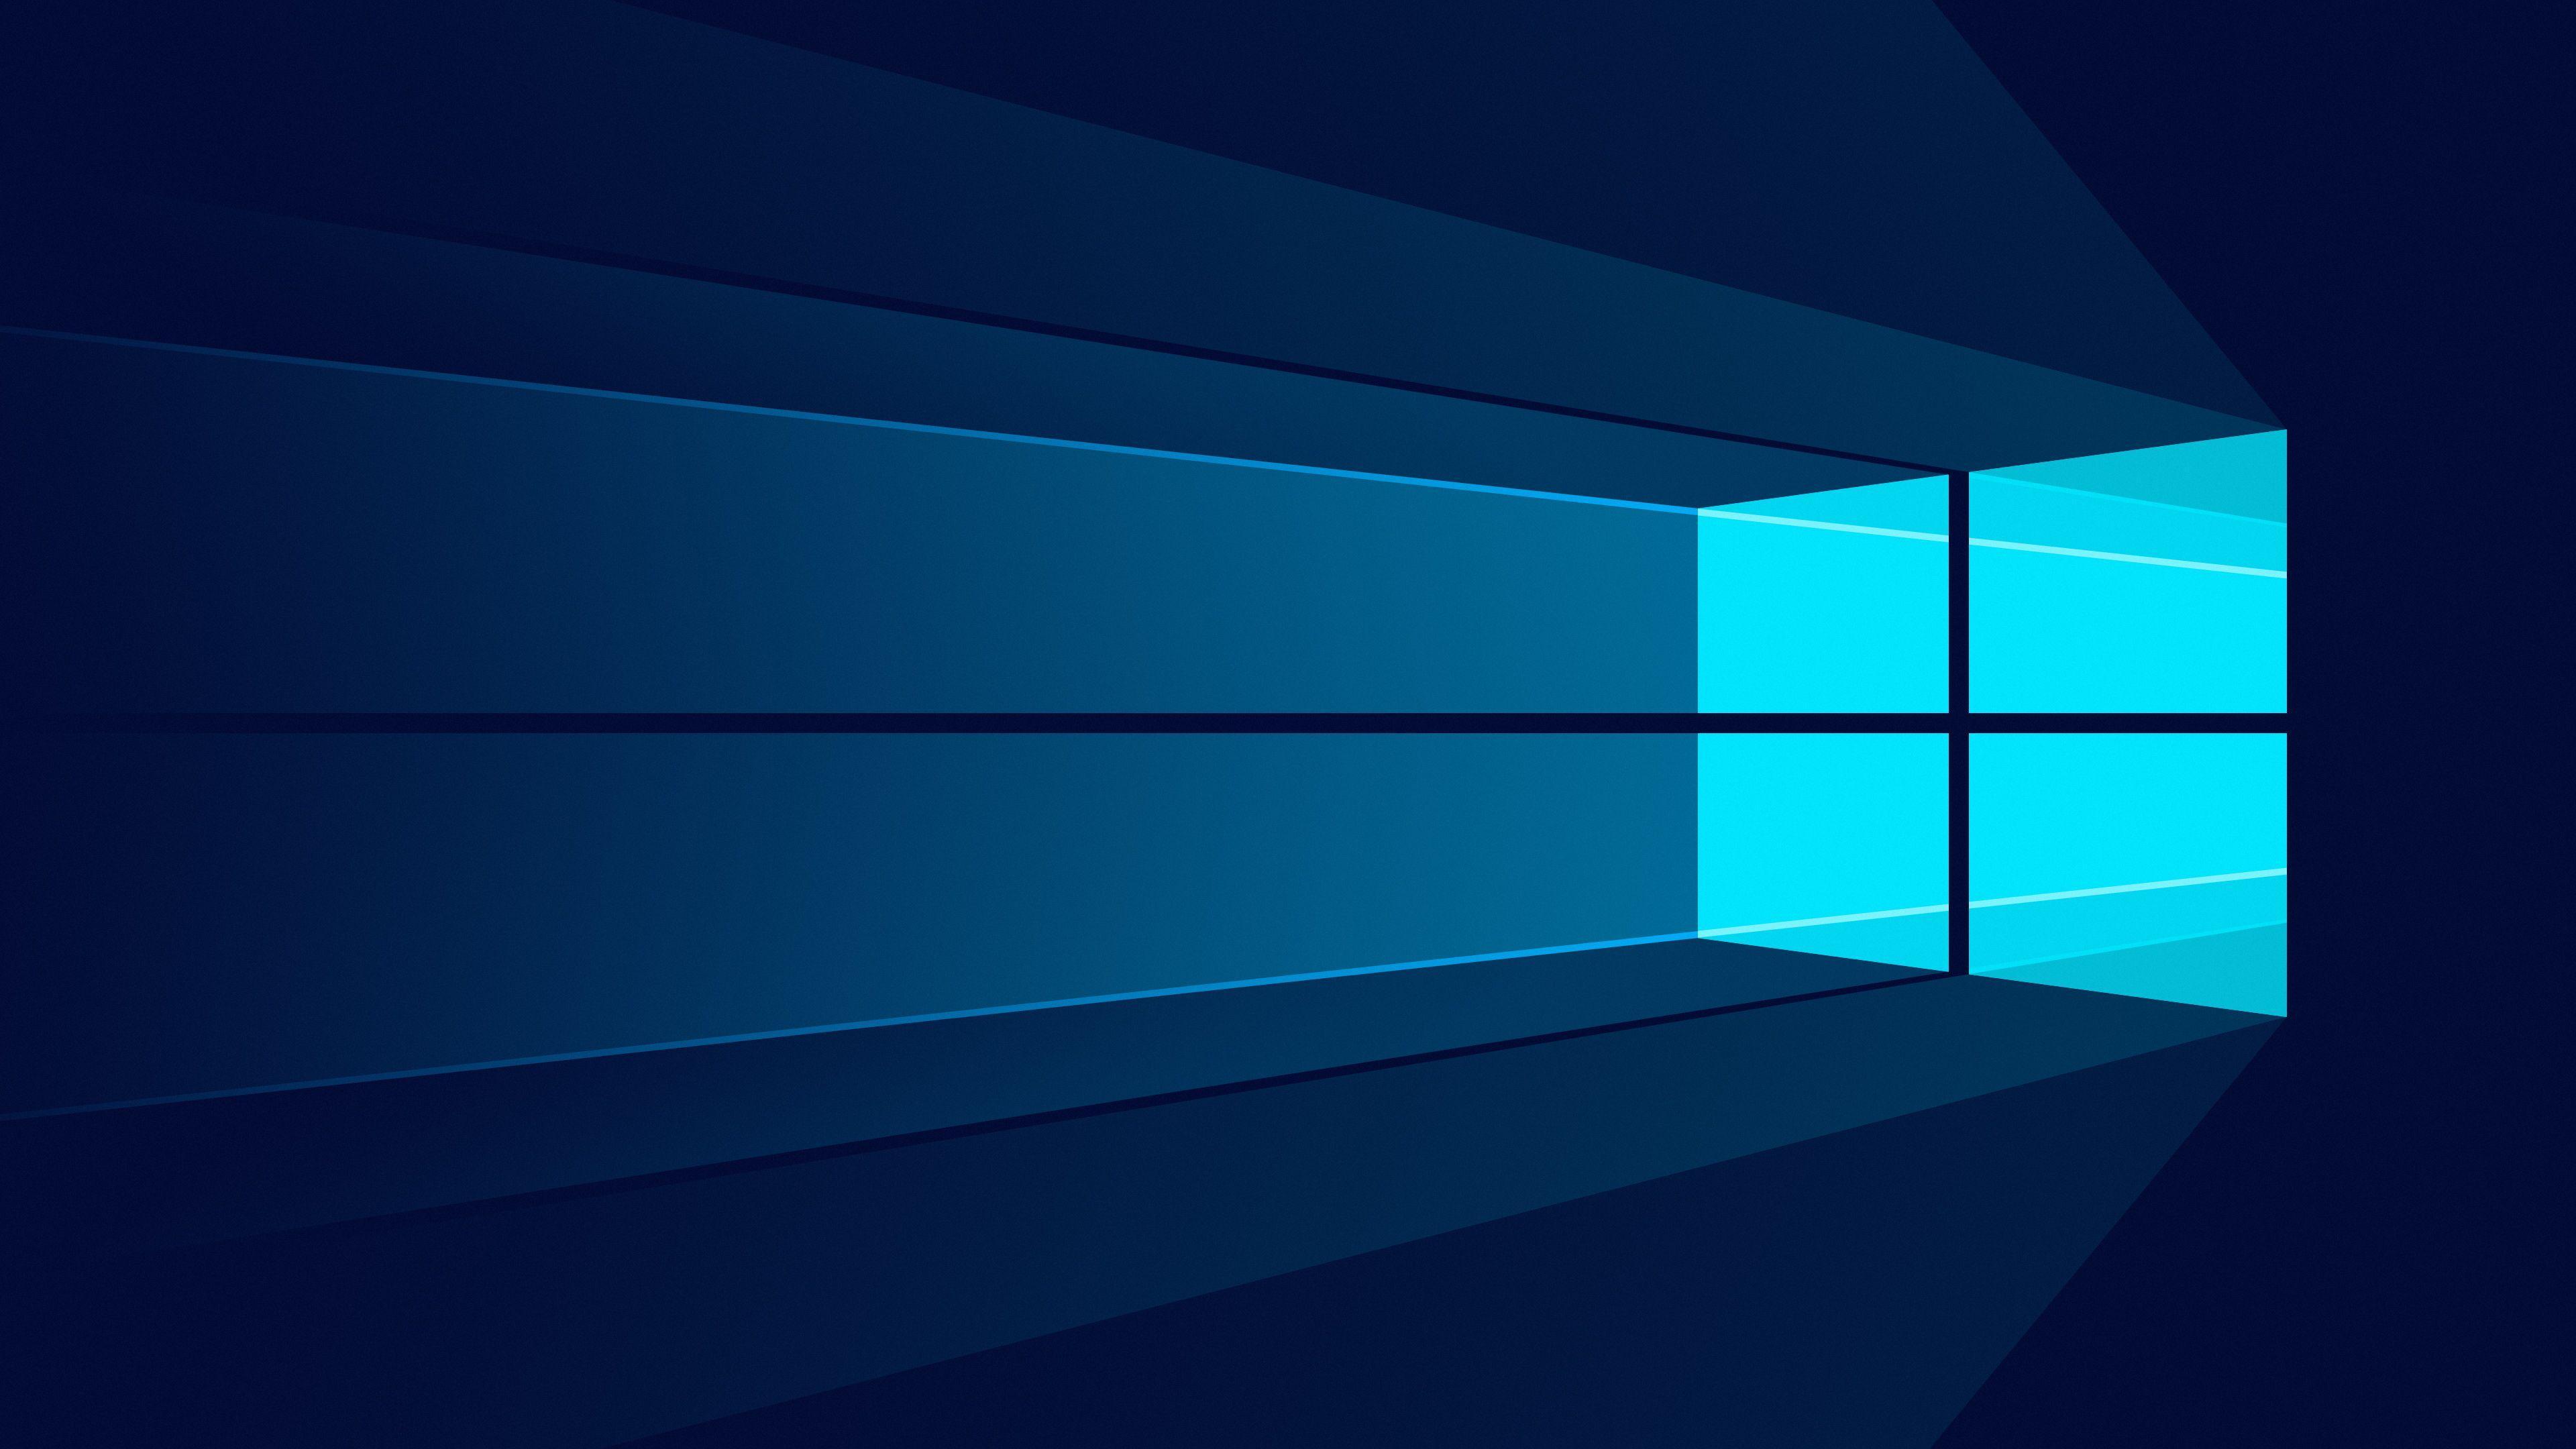 Microsoft 4k Wallpapers Top Free Microsoft 4k Backgrounds